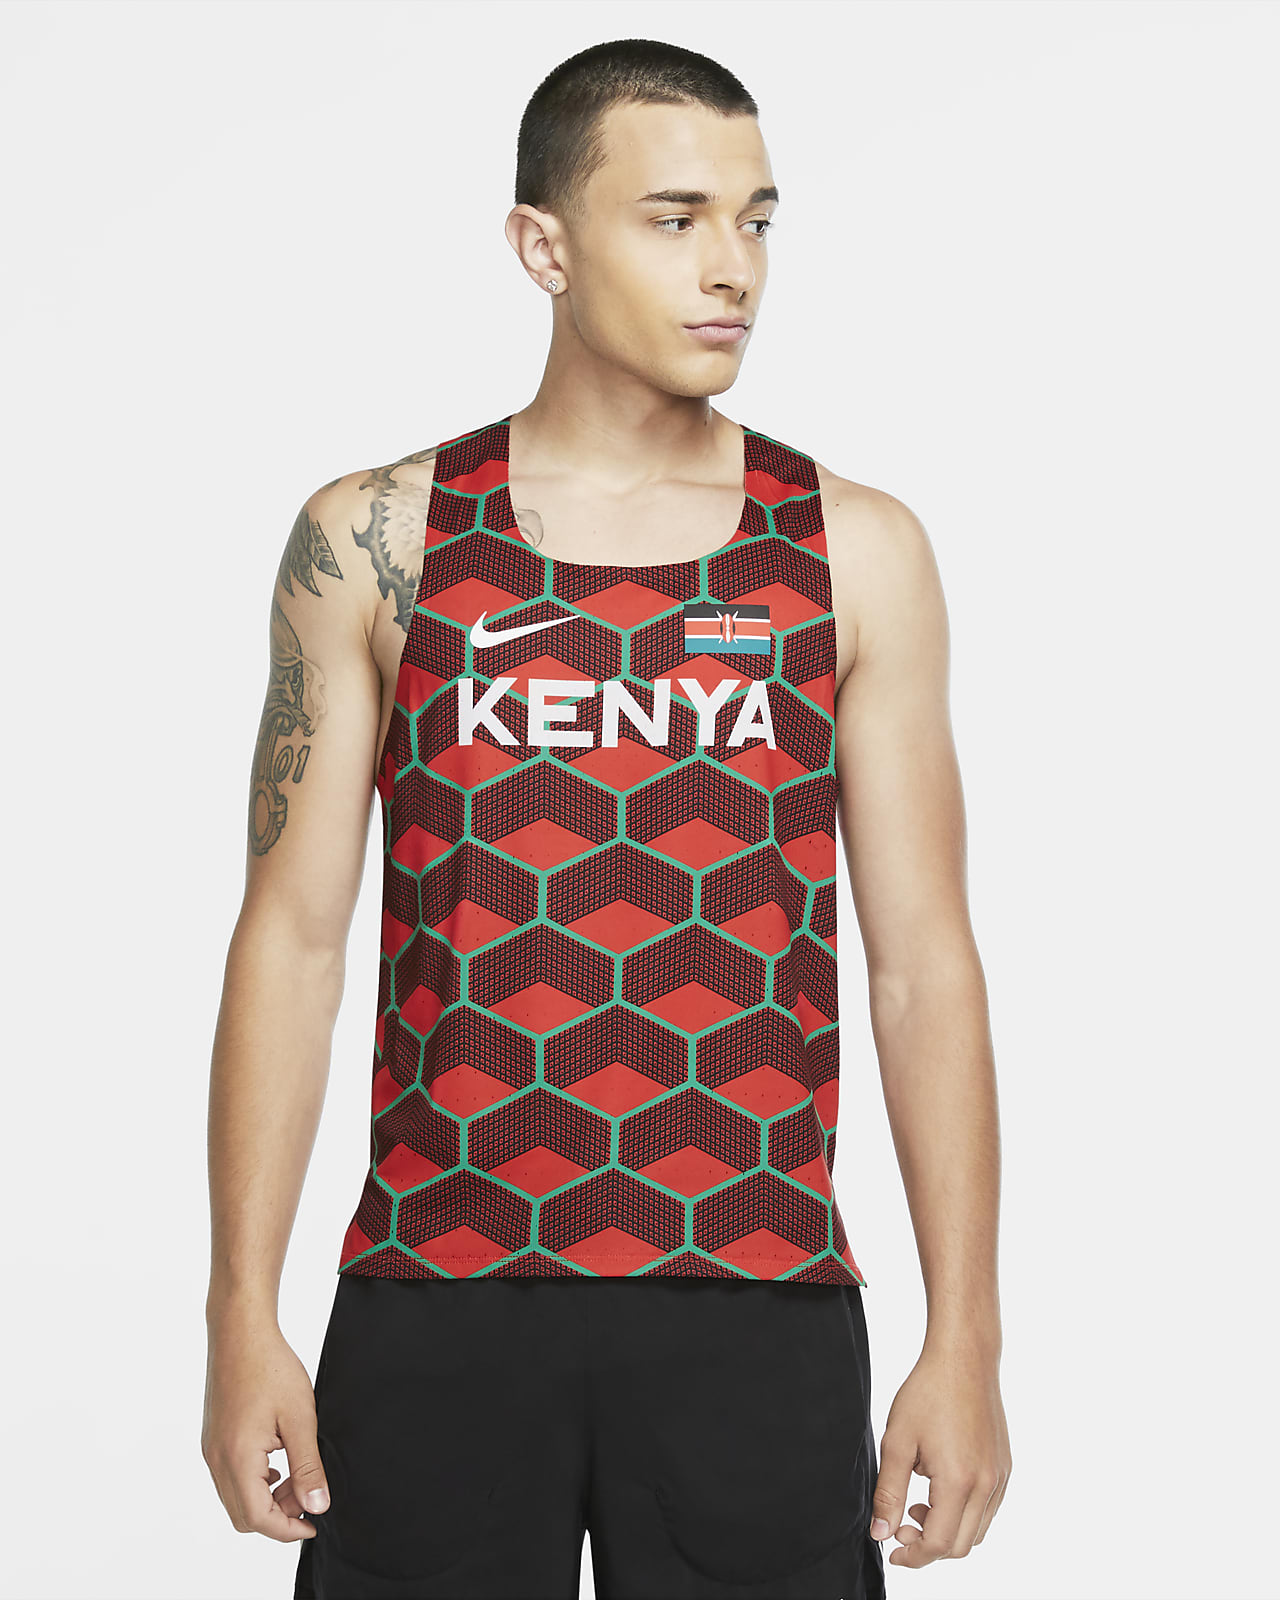 Löparlinne Nike Dri-FIT ADV Team Kenya AeroSwift för män